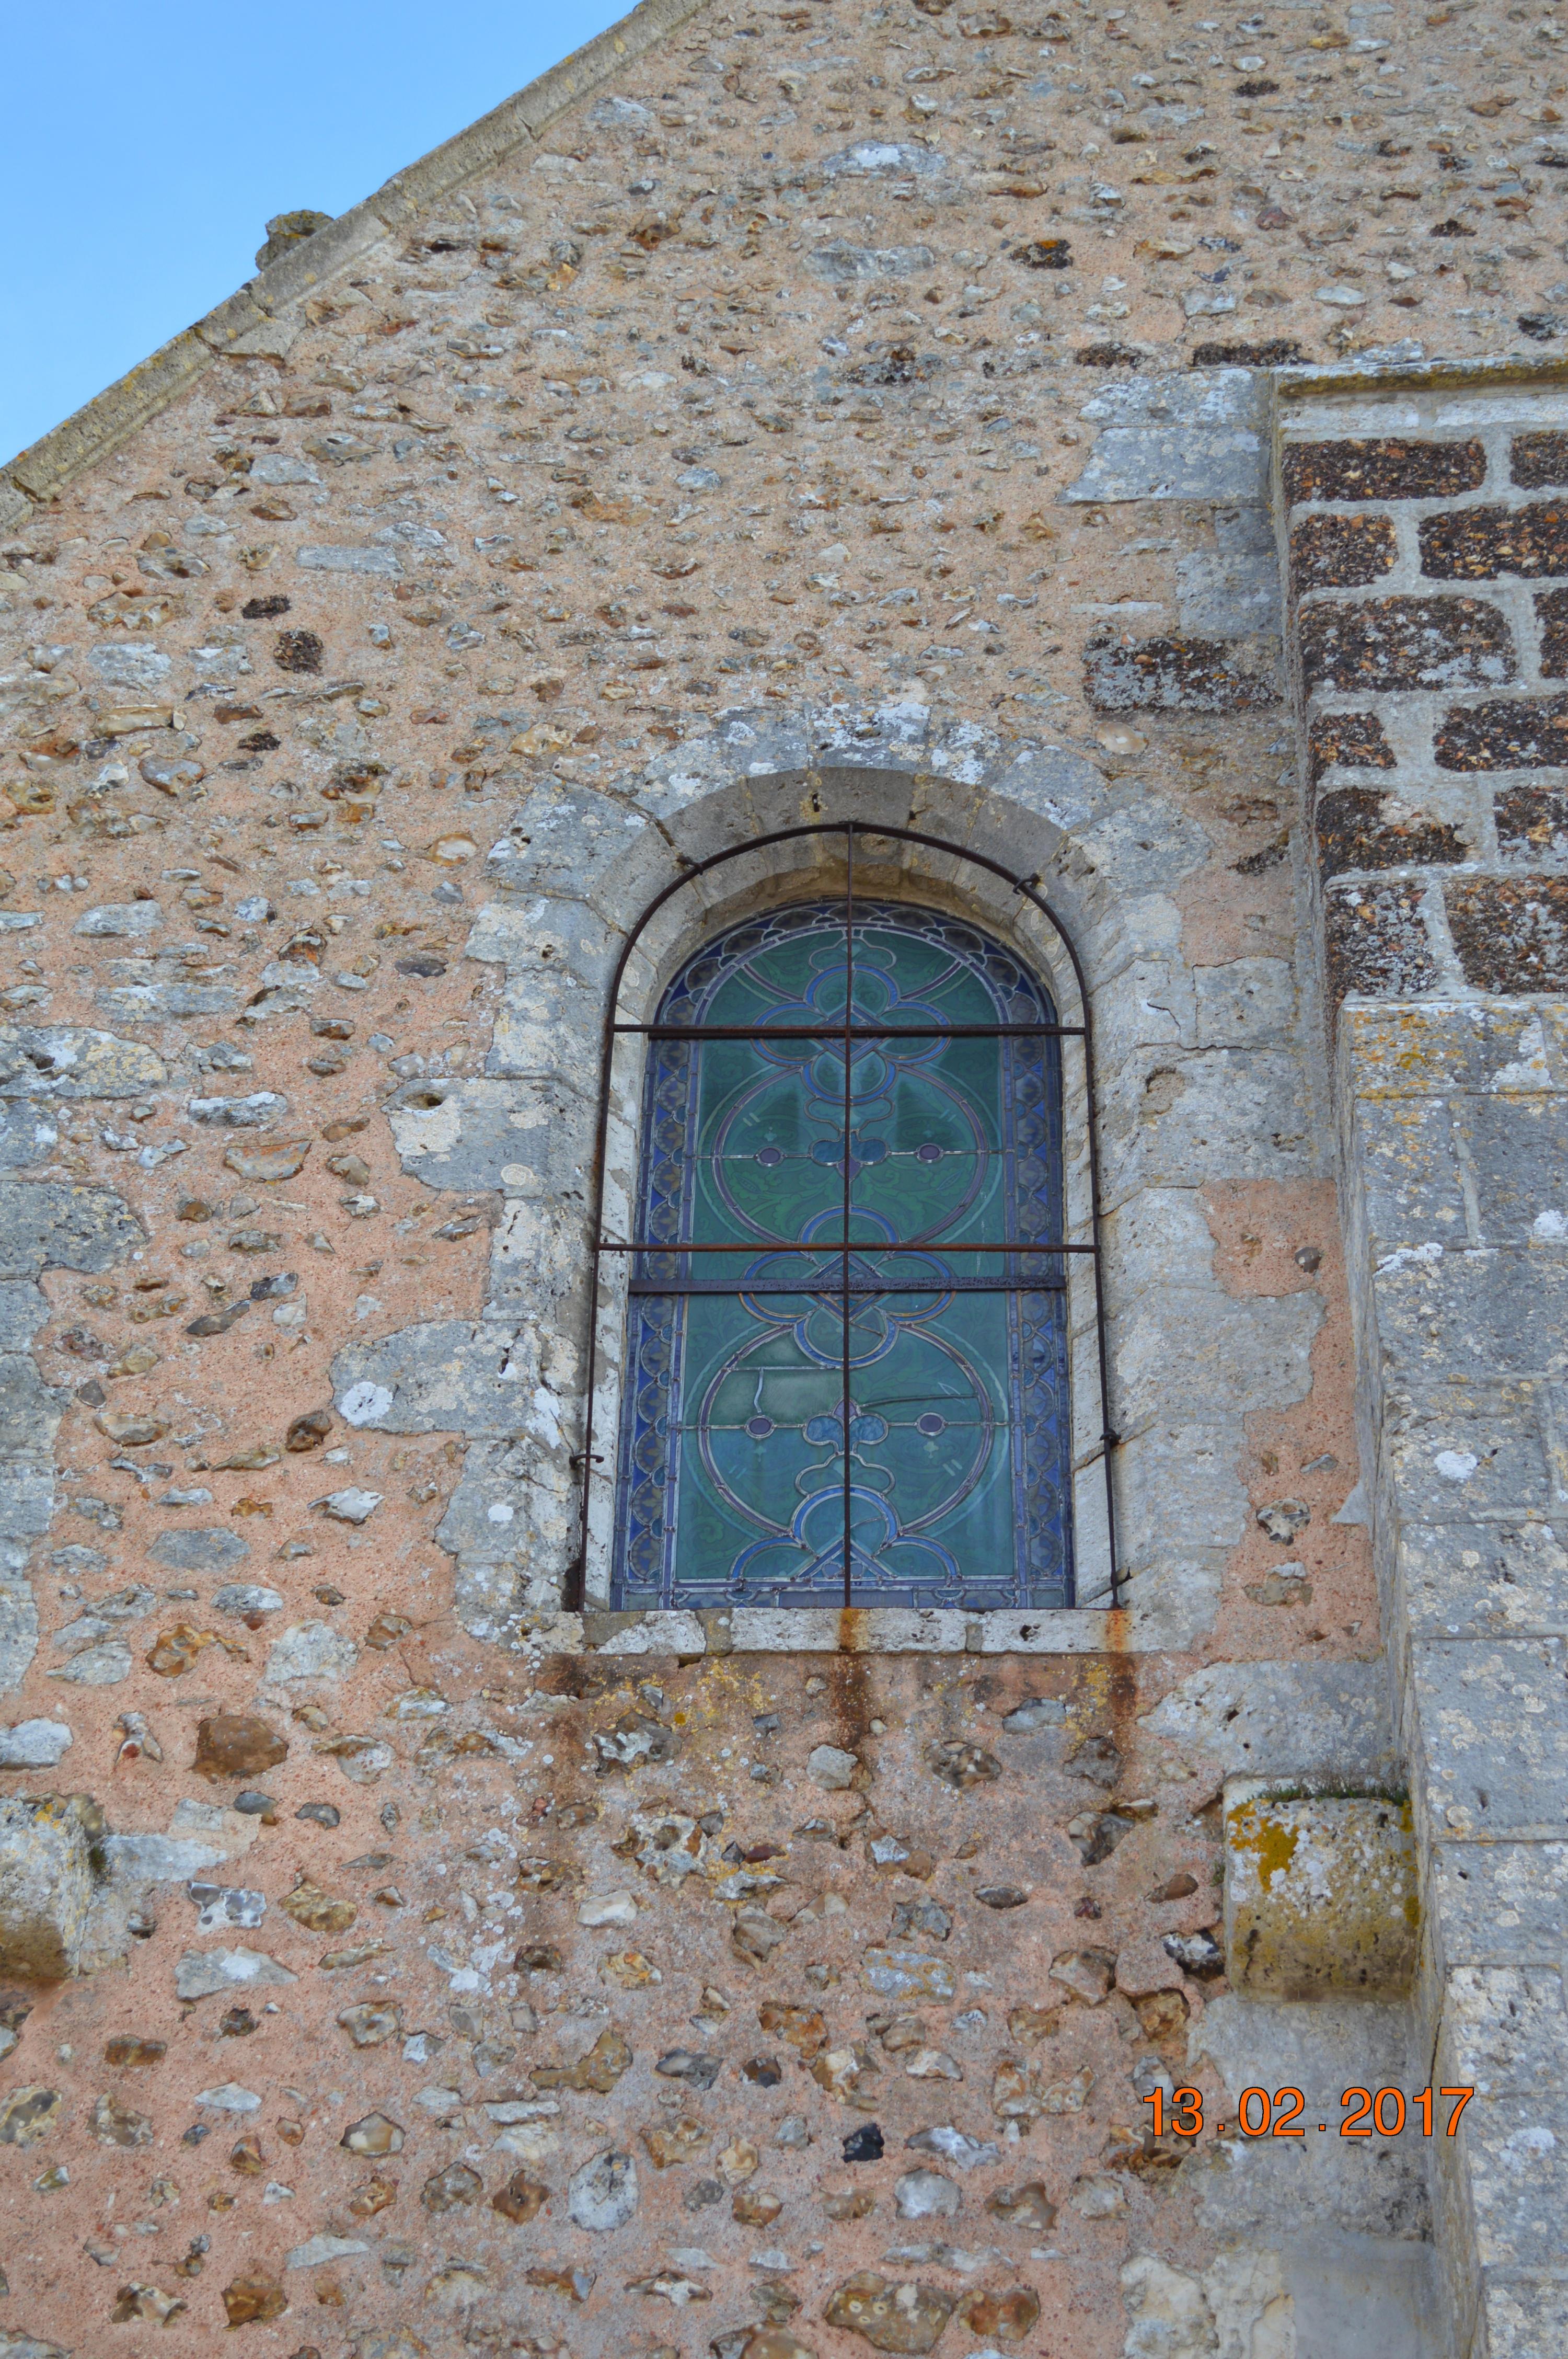 eglise vitrail cote portail.jpg